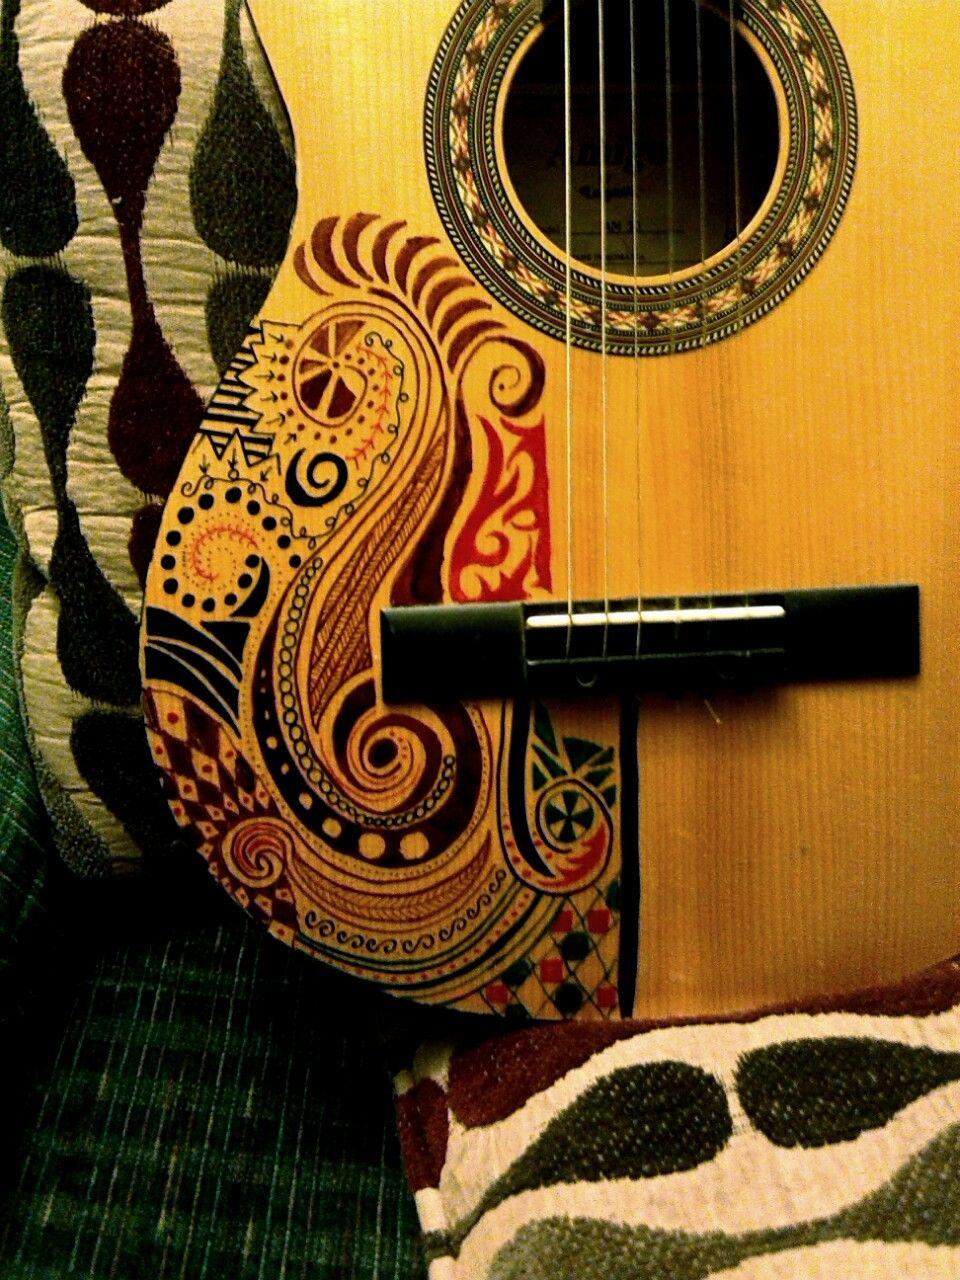 Cheap Old Guitar Sharpie Matte Finish Spray Varnish To